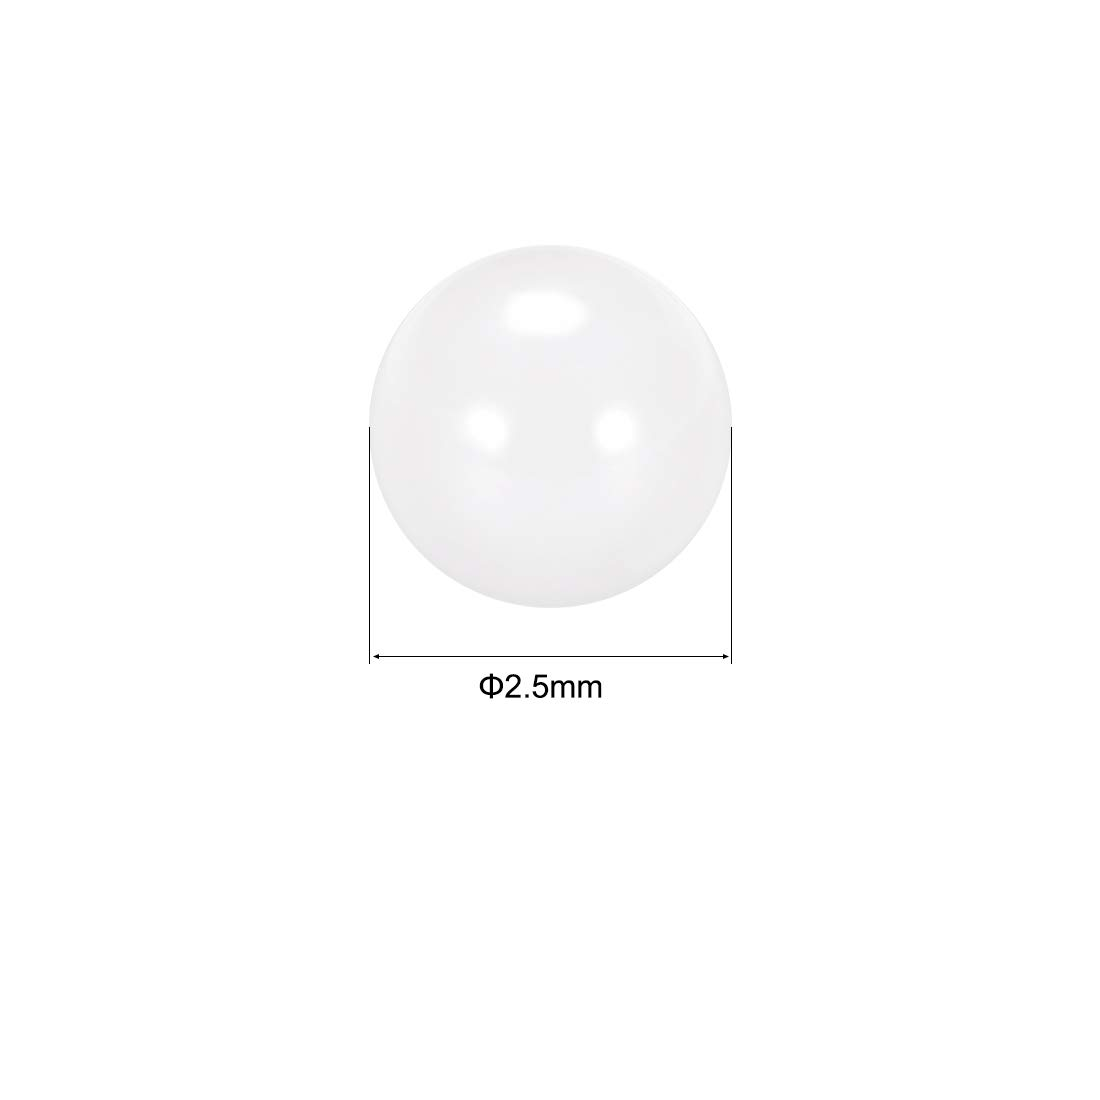 "10 PCS Ceramic Zirconia Oxide Loose Bearing Balls G5 ZrO2 3mm 0.1181/"""